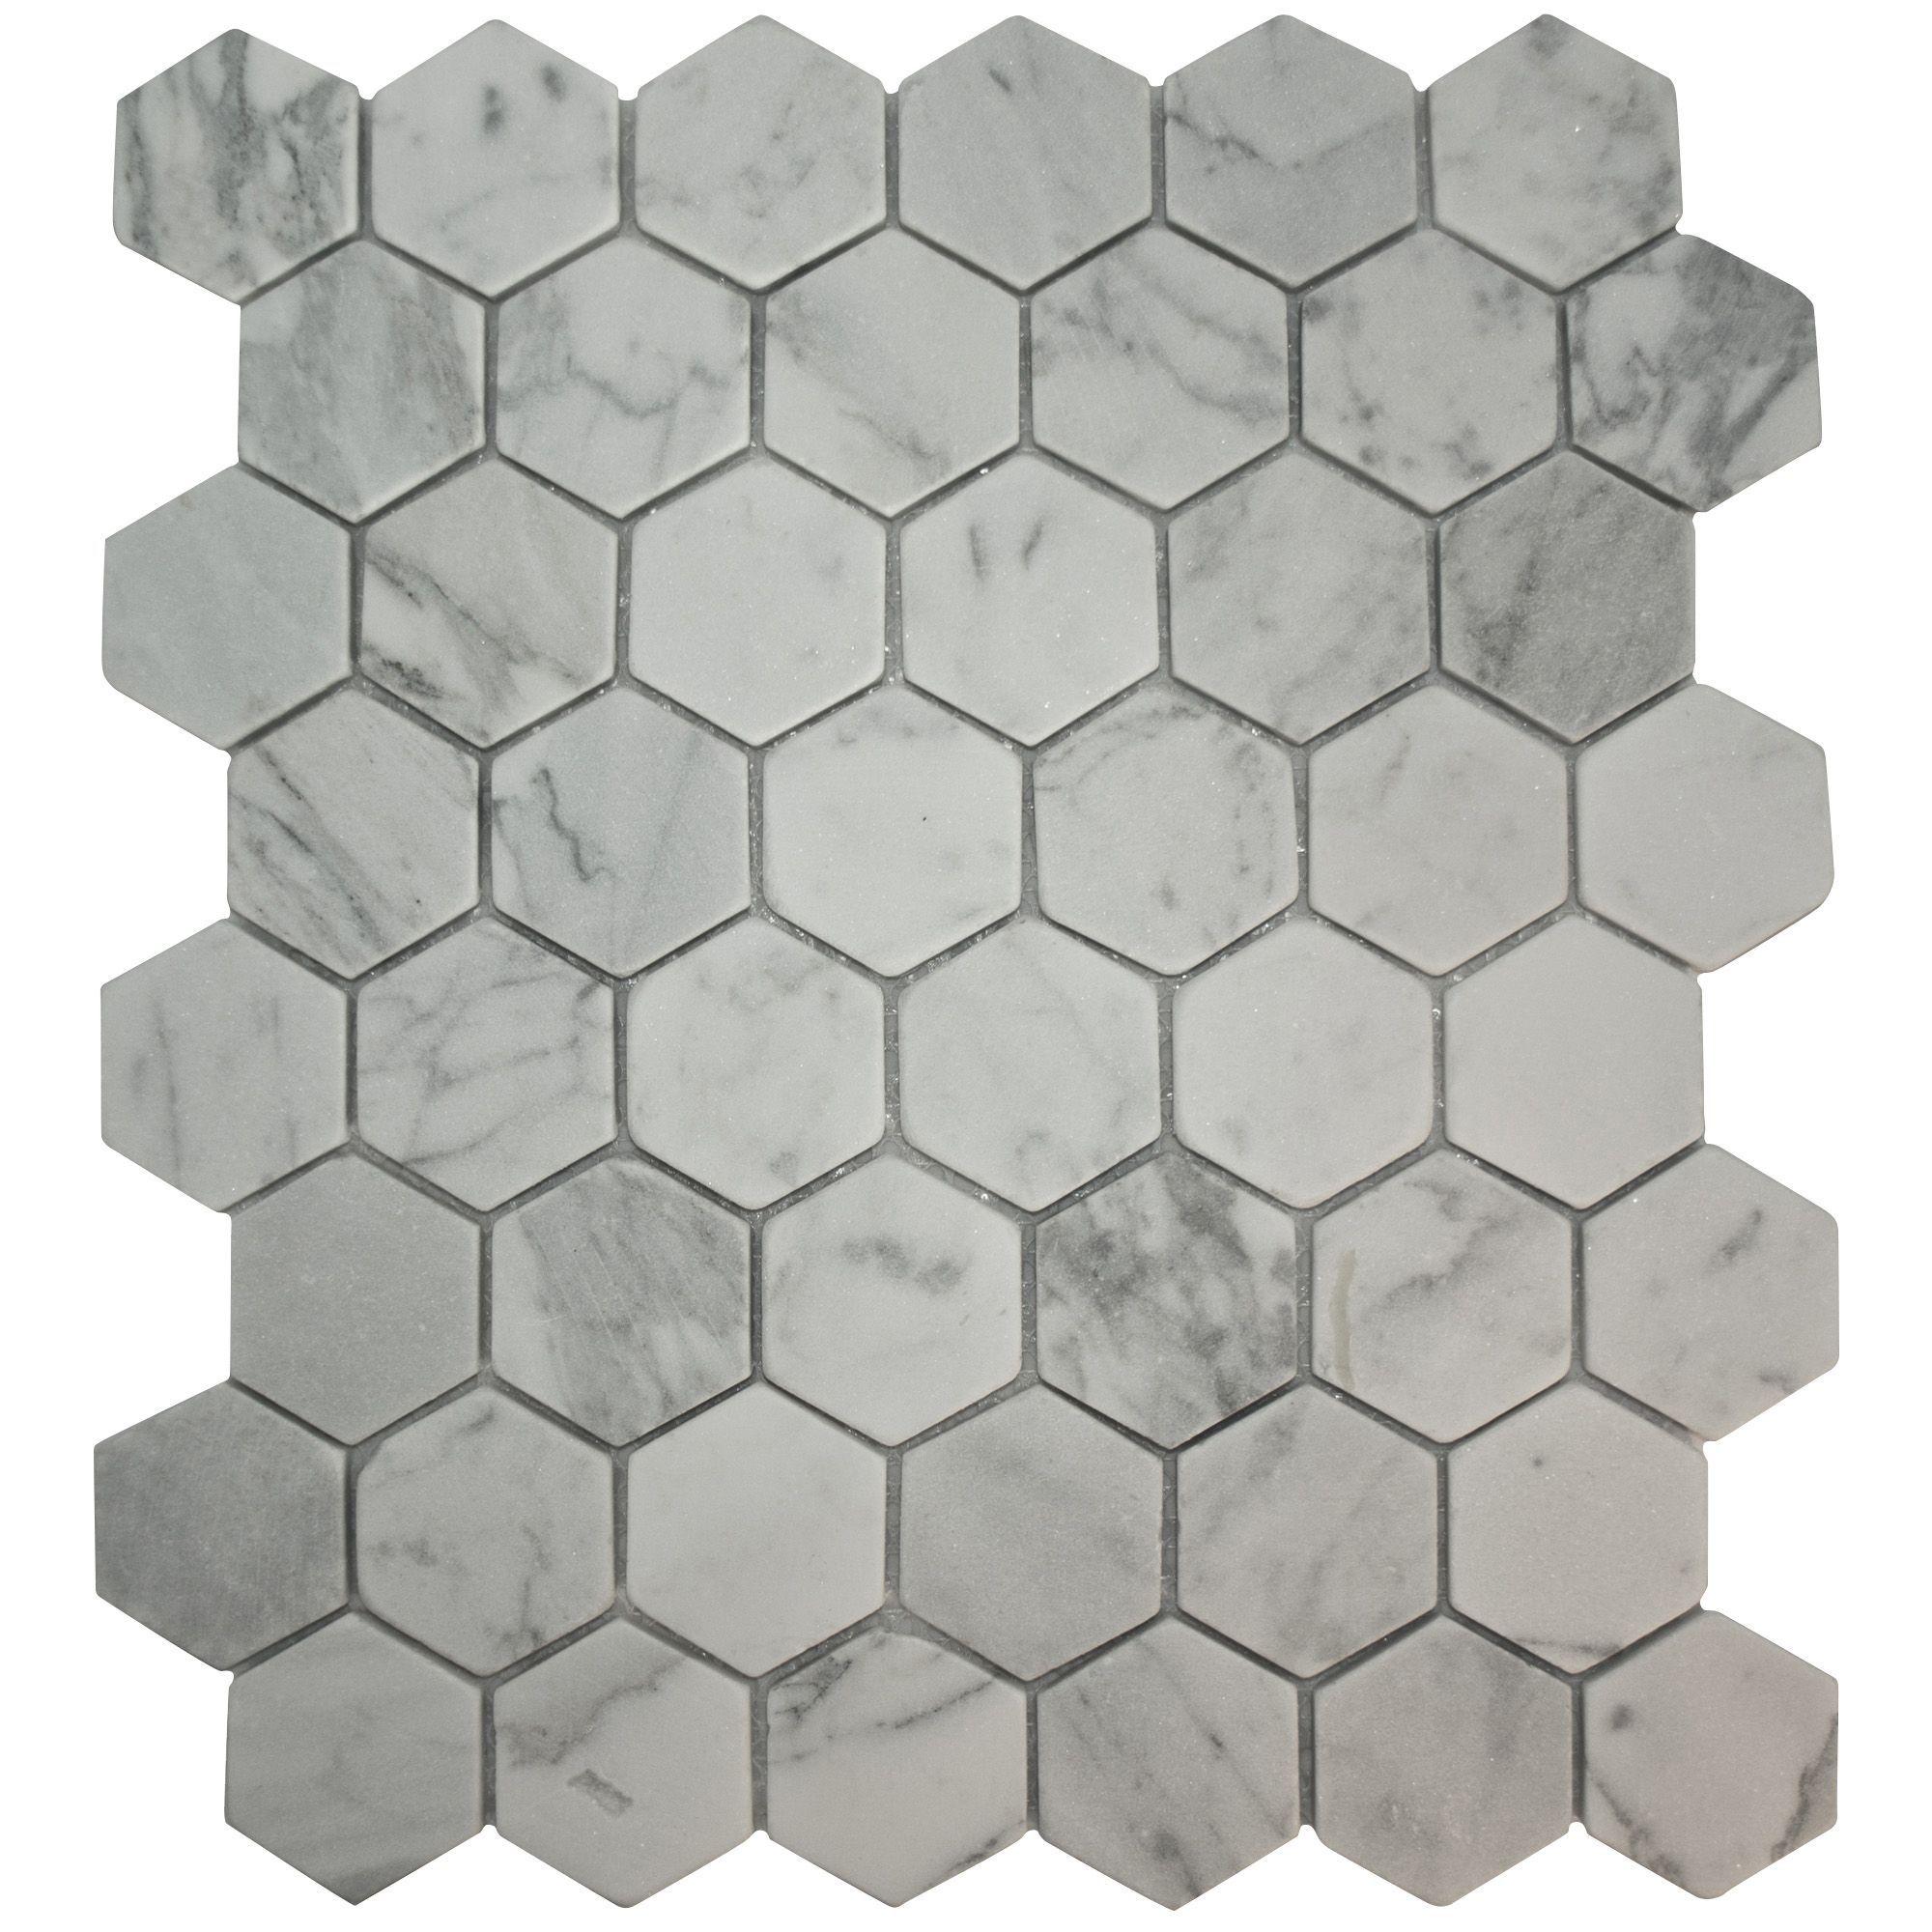 bronte white grey stone effect mosaic tile l 321mm w. Black Bedroom Furniture Sets. Home Design Ideas